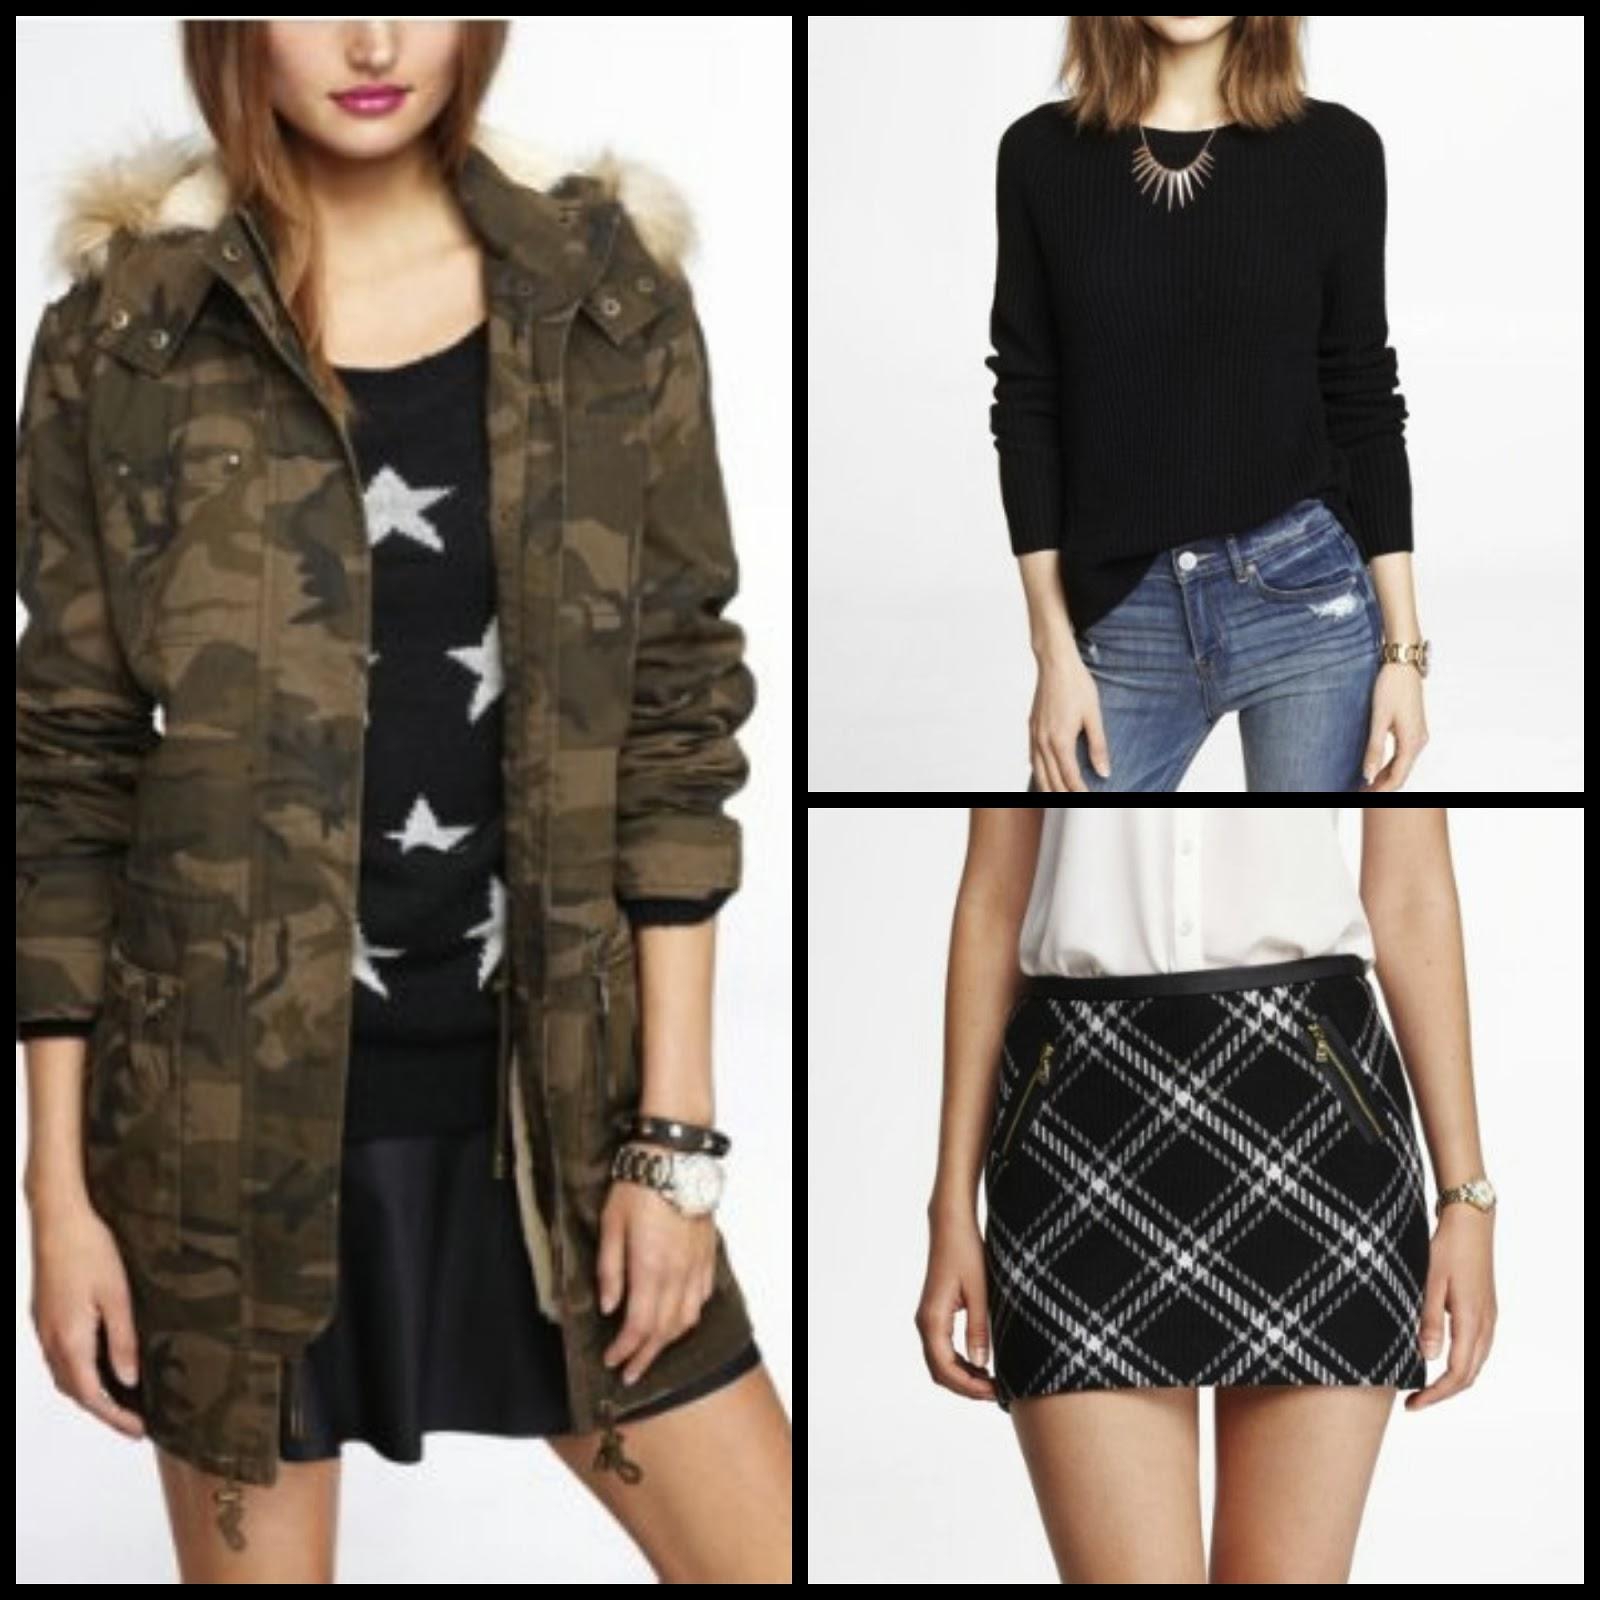 camouflage parka, tartan plaid mini skirt, side slit shaker sweater